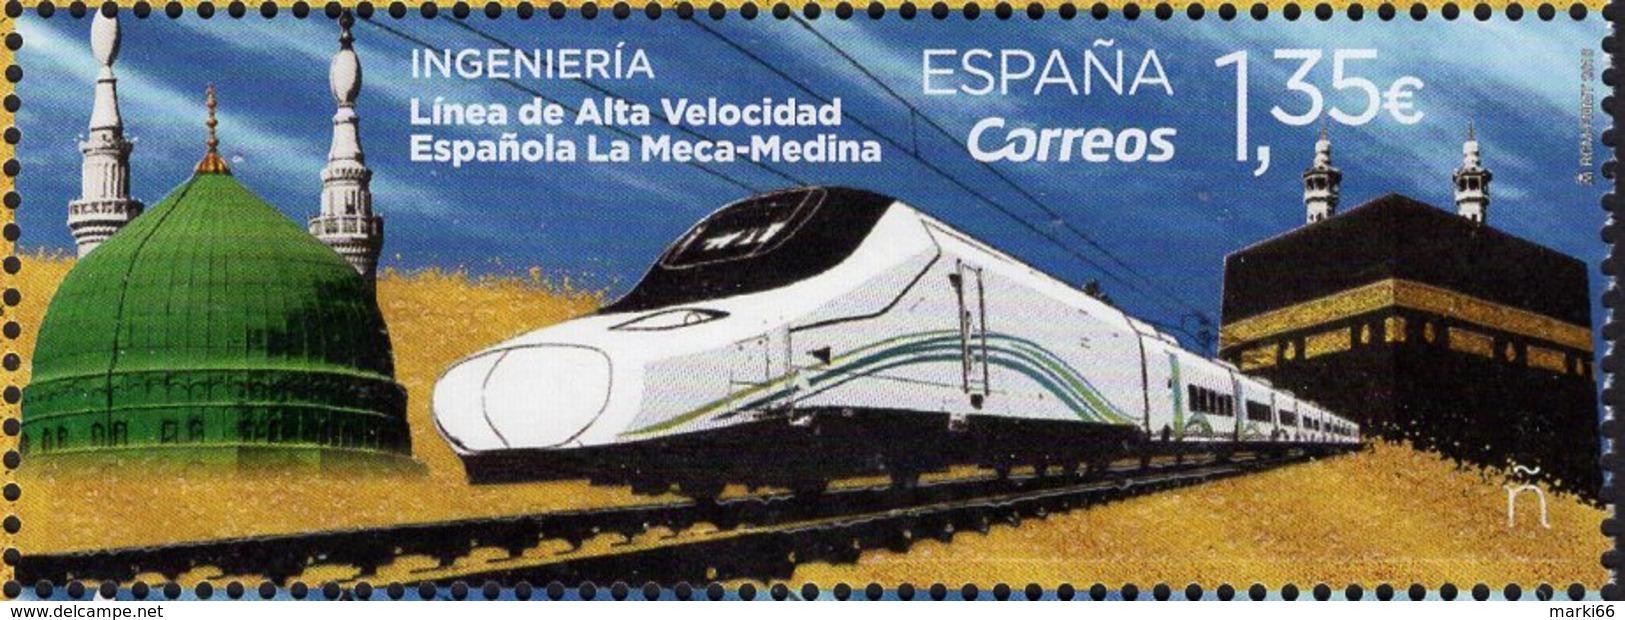 Spain - 2018 - High Speed Railway Mecca - Medina - Mint Stamp Imprinted With Real Desert Sand - 1931-Aujourd'hui: II. République - ....Juan Carlos I